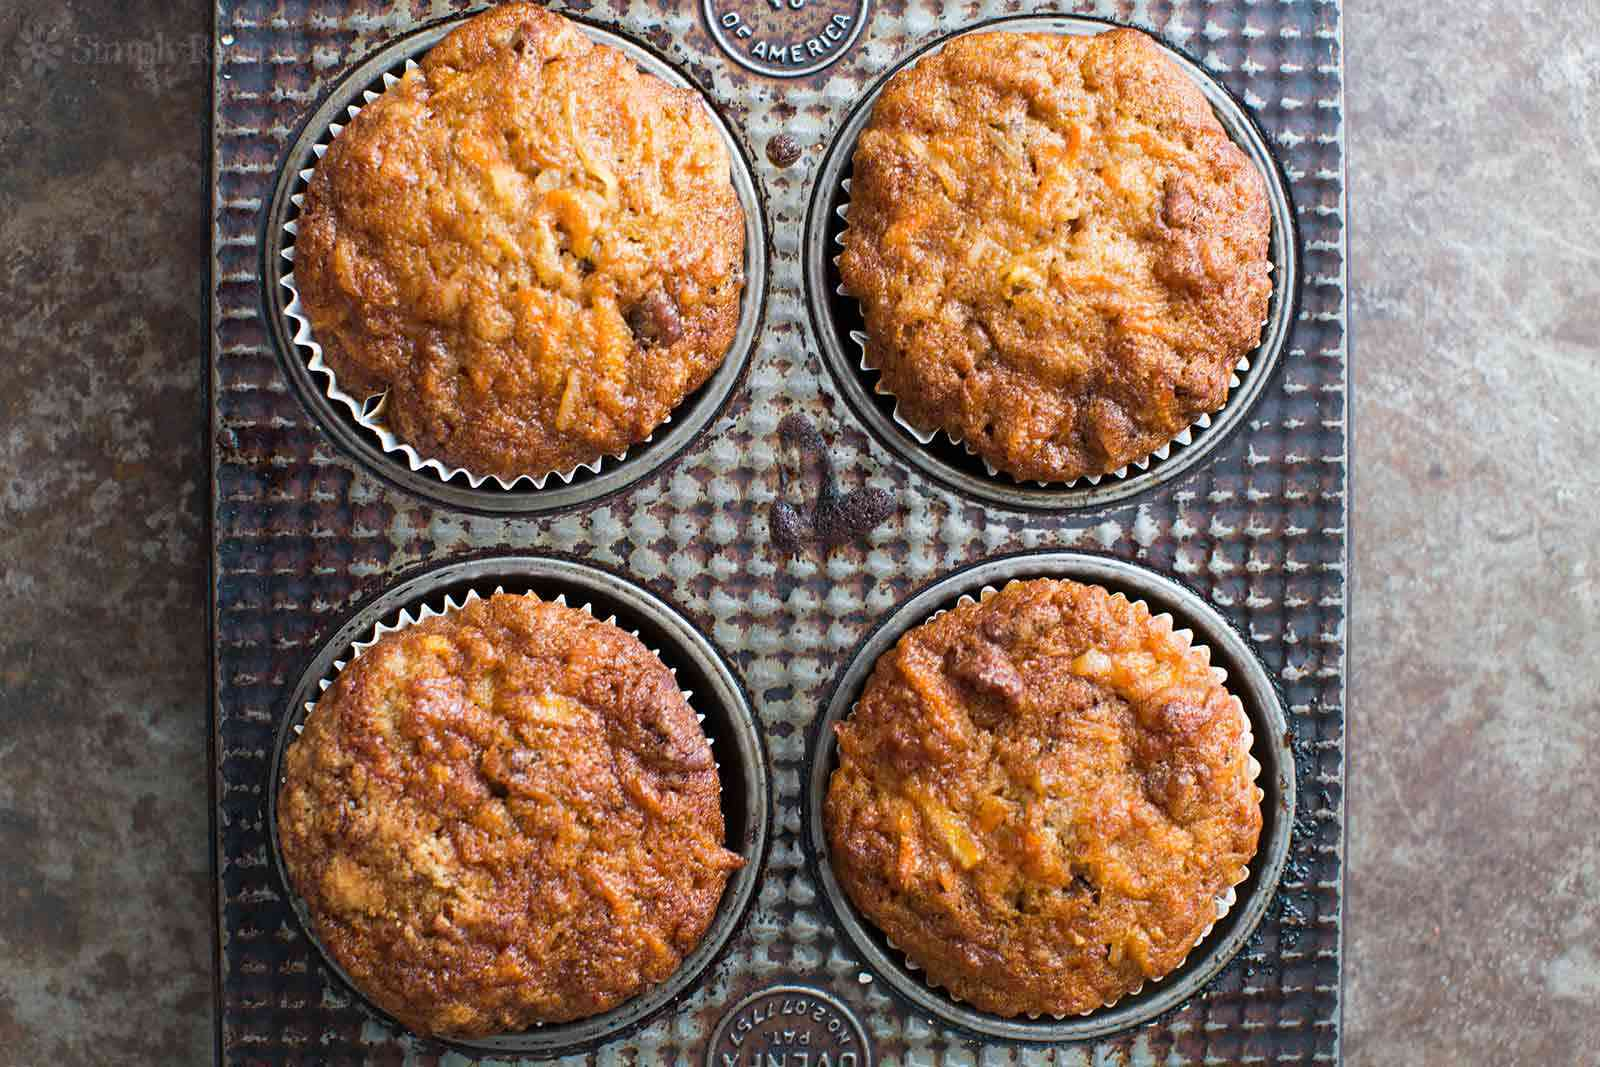 Apple Carrot Cupcakes in baking tin